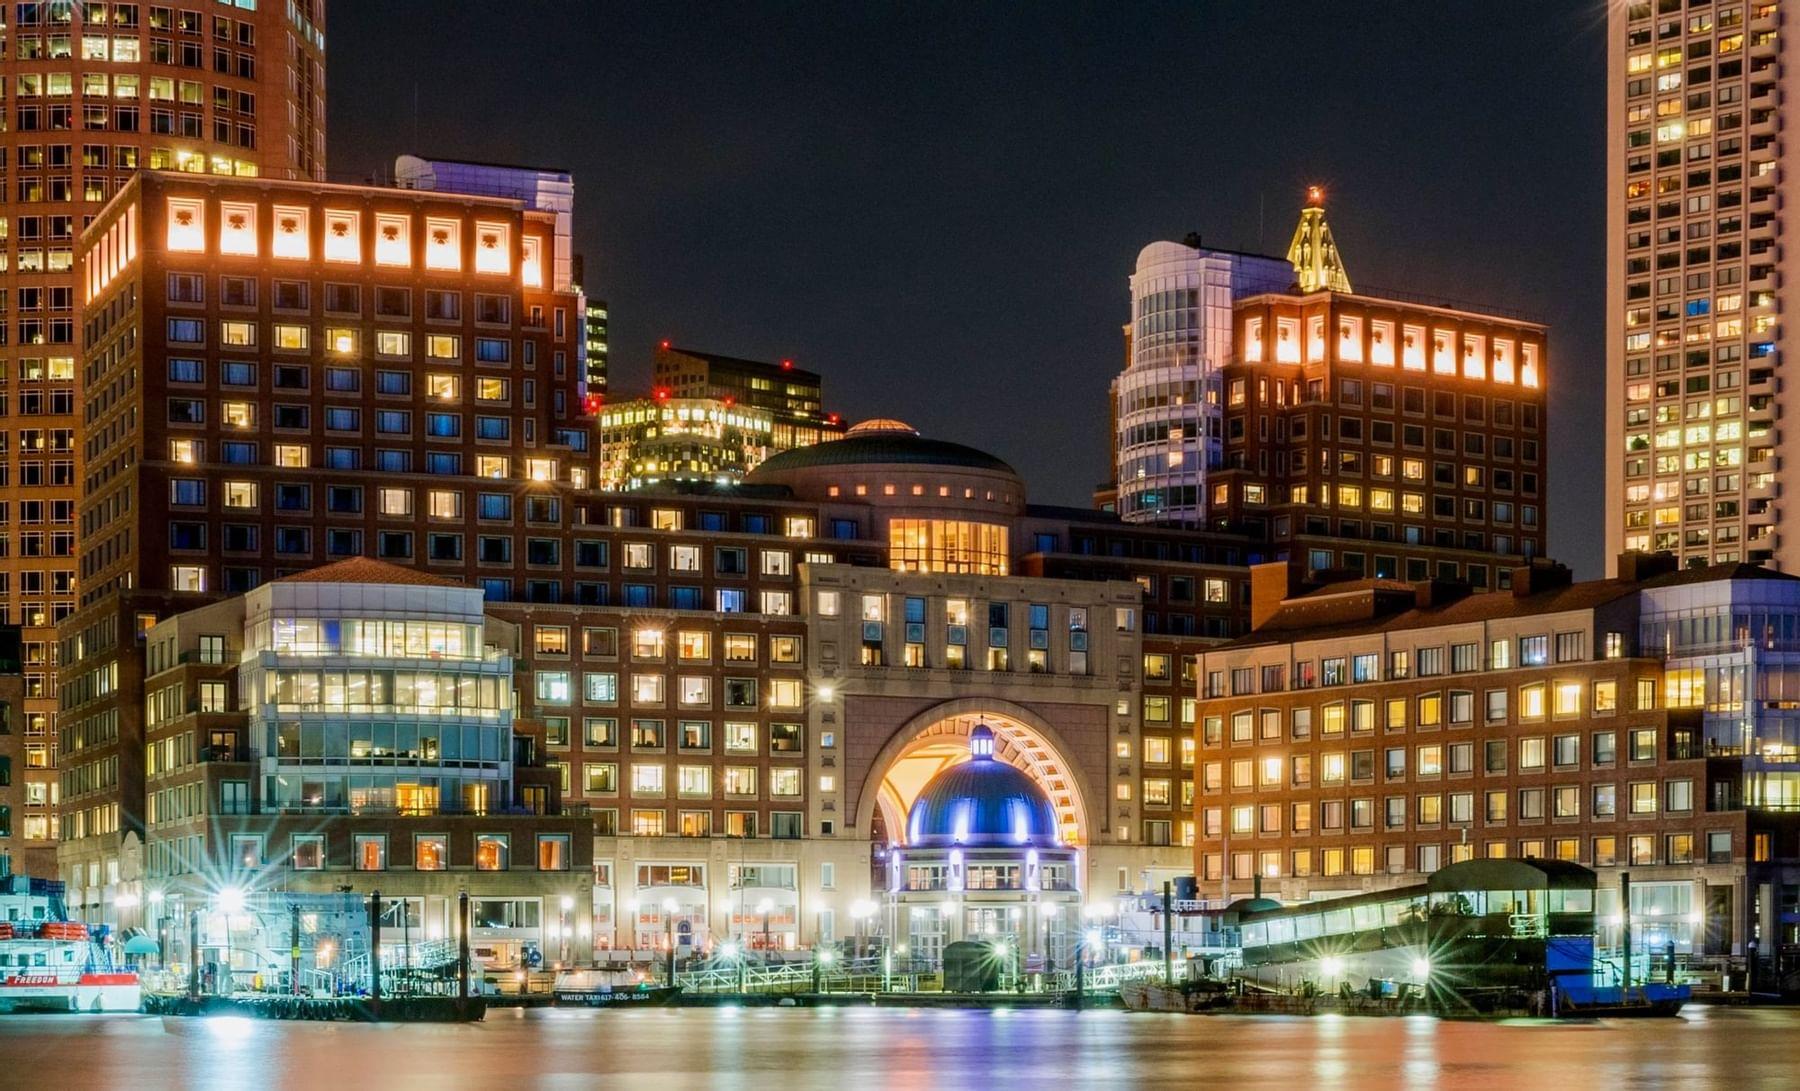 Boston Harbor skyline in the evening